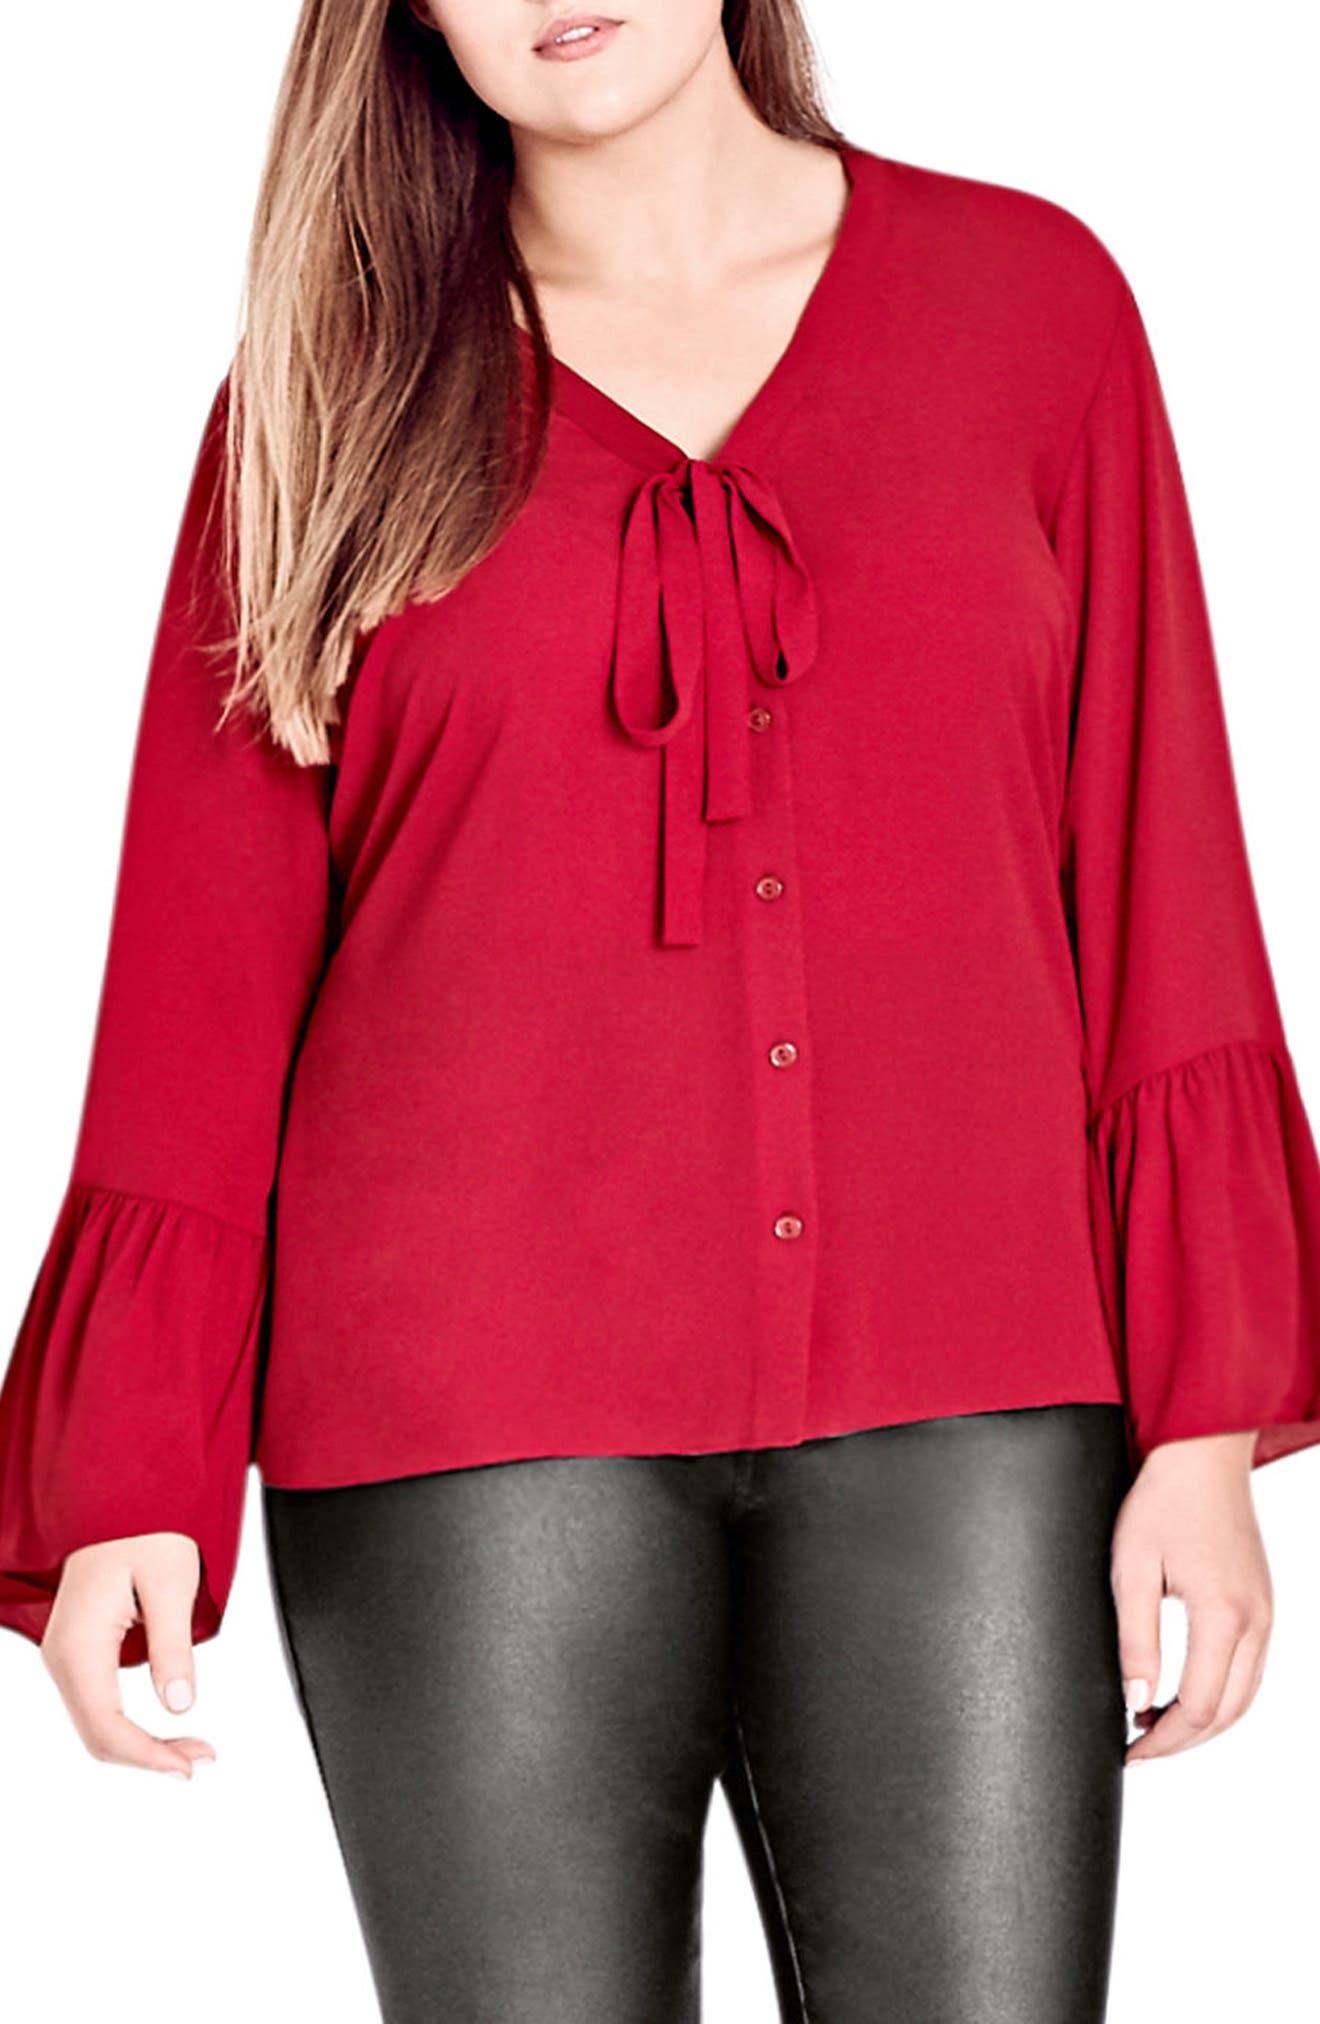 Office Fling Shirt,                         Main,                         color, RED ROSE